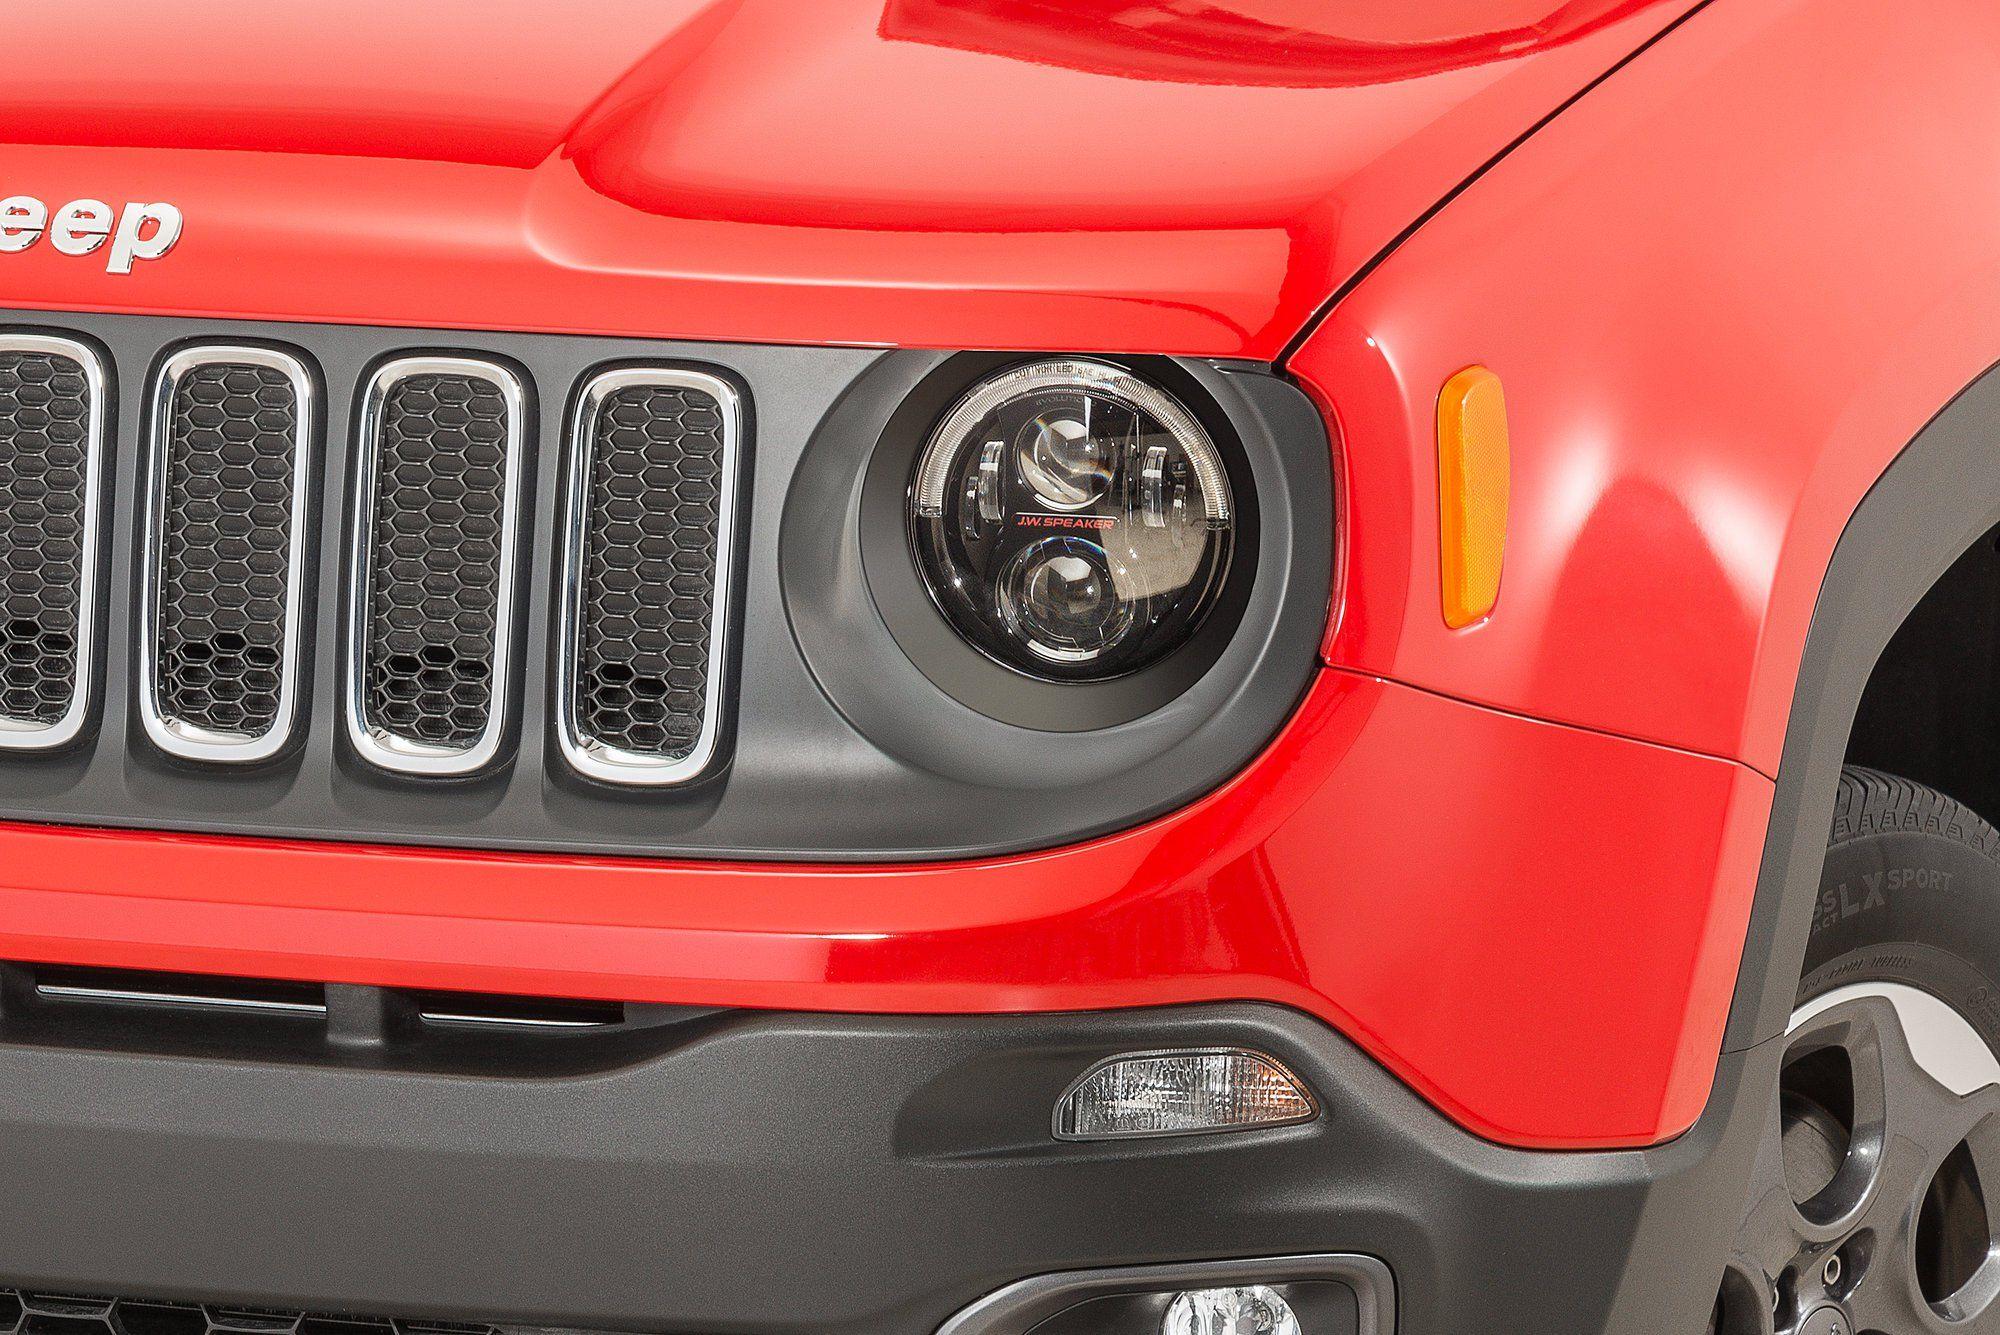 J W Speaker 8700 Evolution 2r Headlight Kit For 15 20 Jeep Renegade